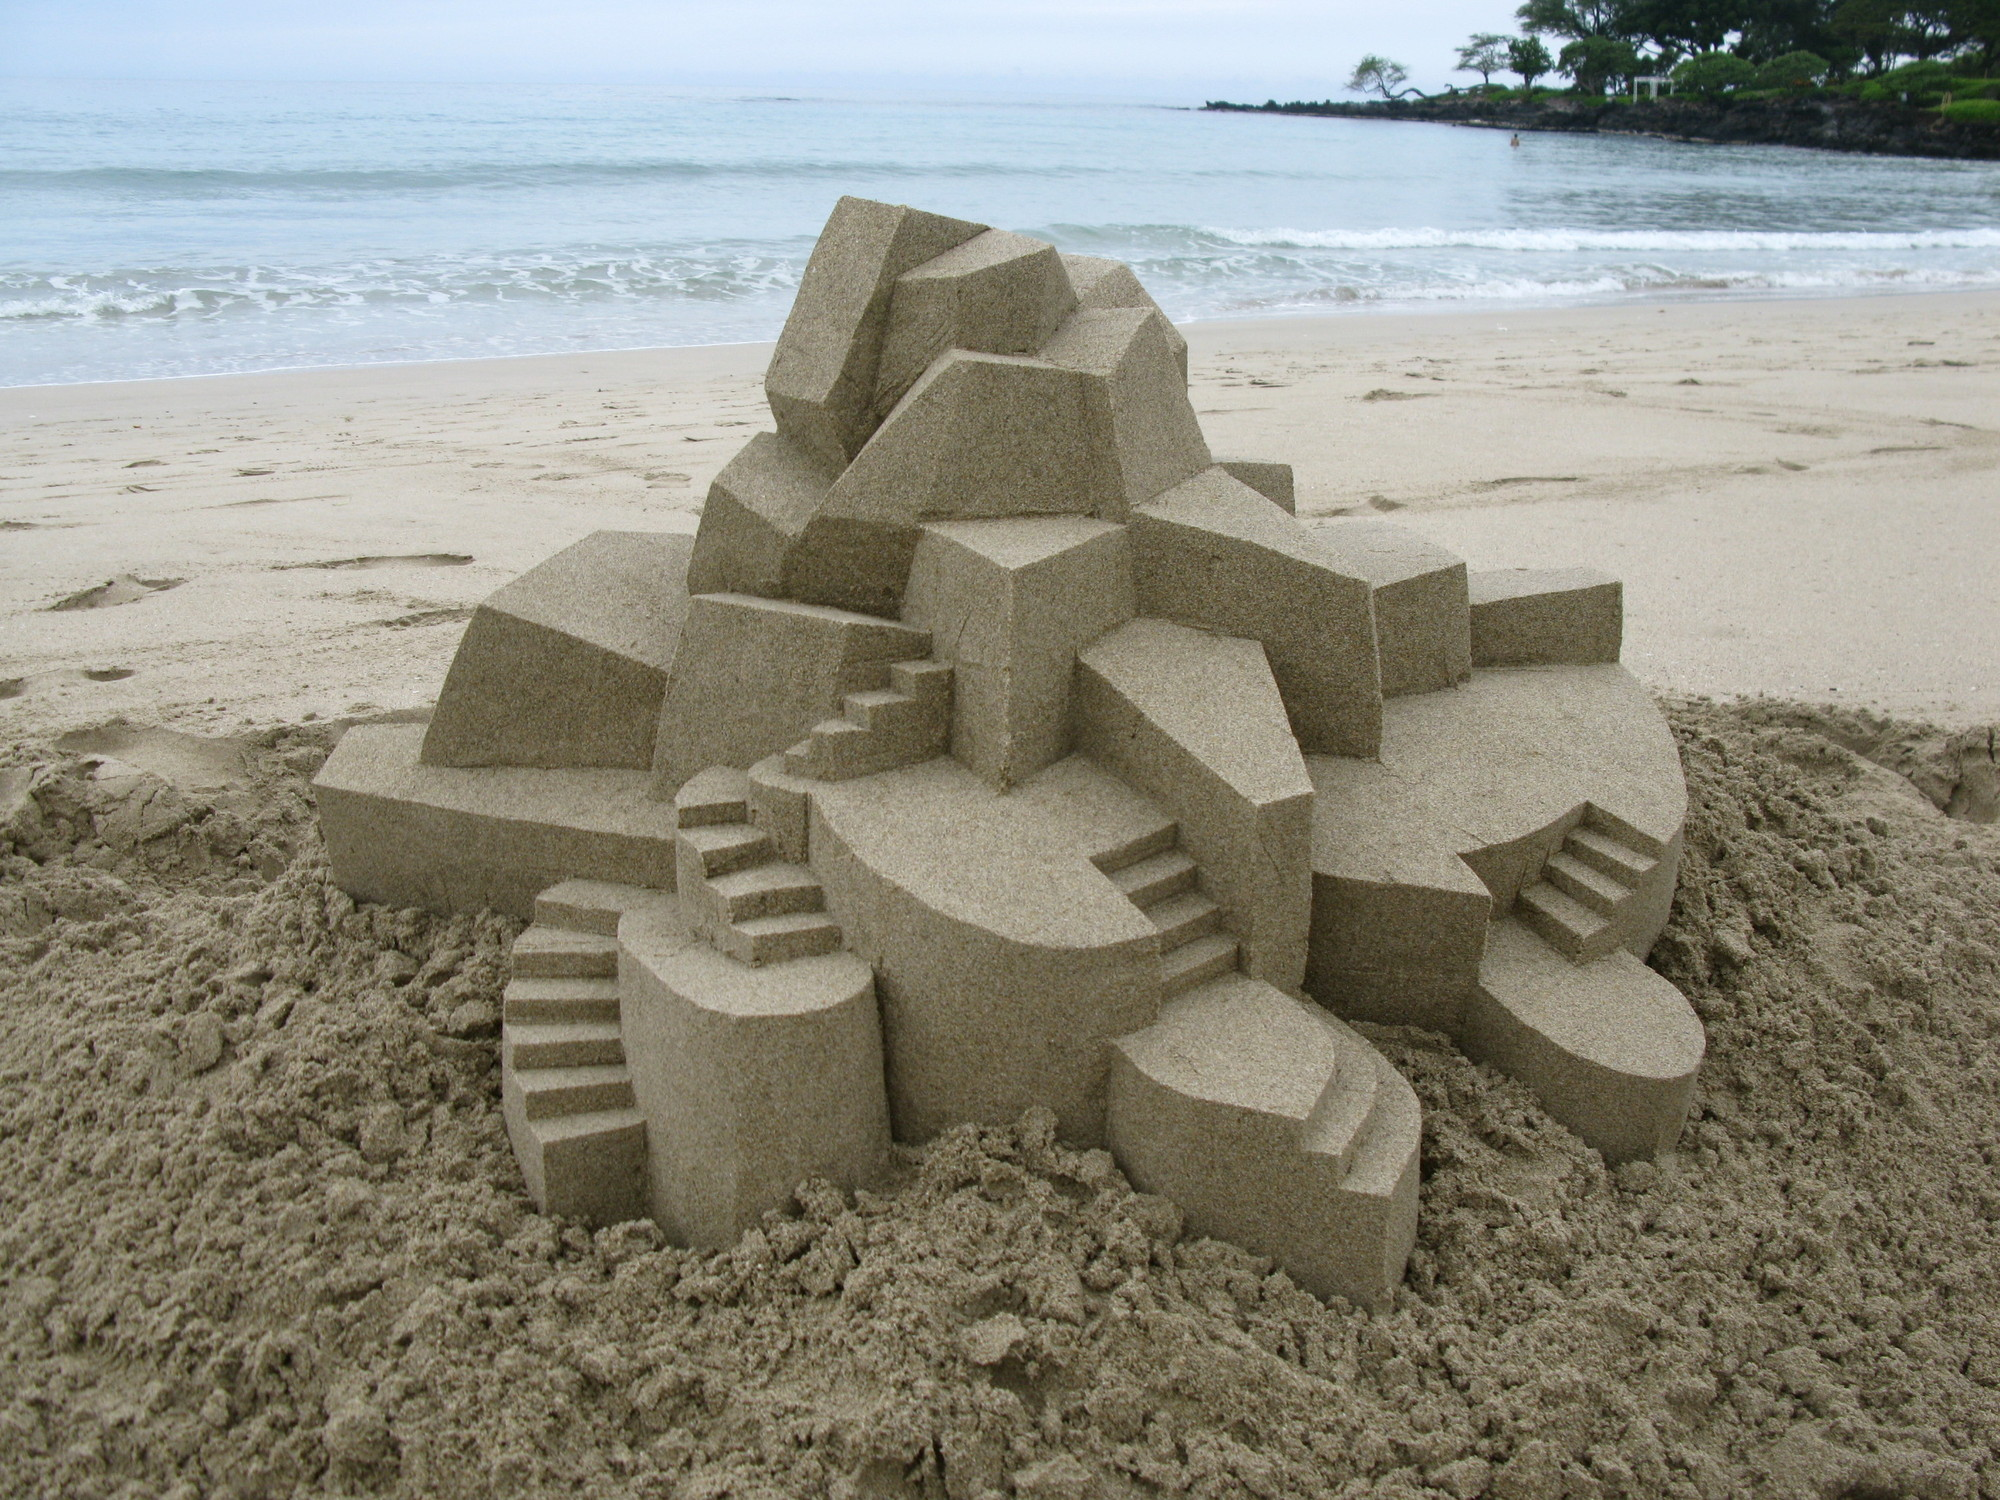 Best Image Calvin Seibert Sculpts Impressive Modernist Sandcastles